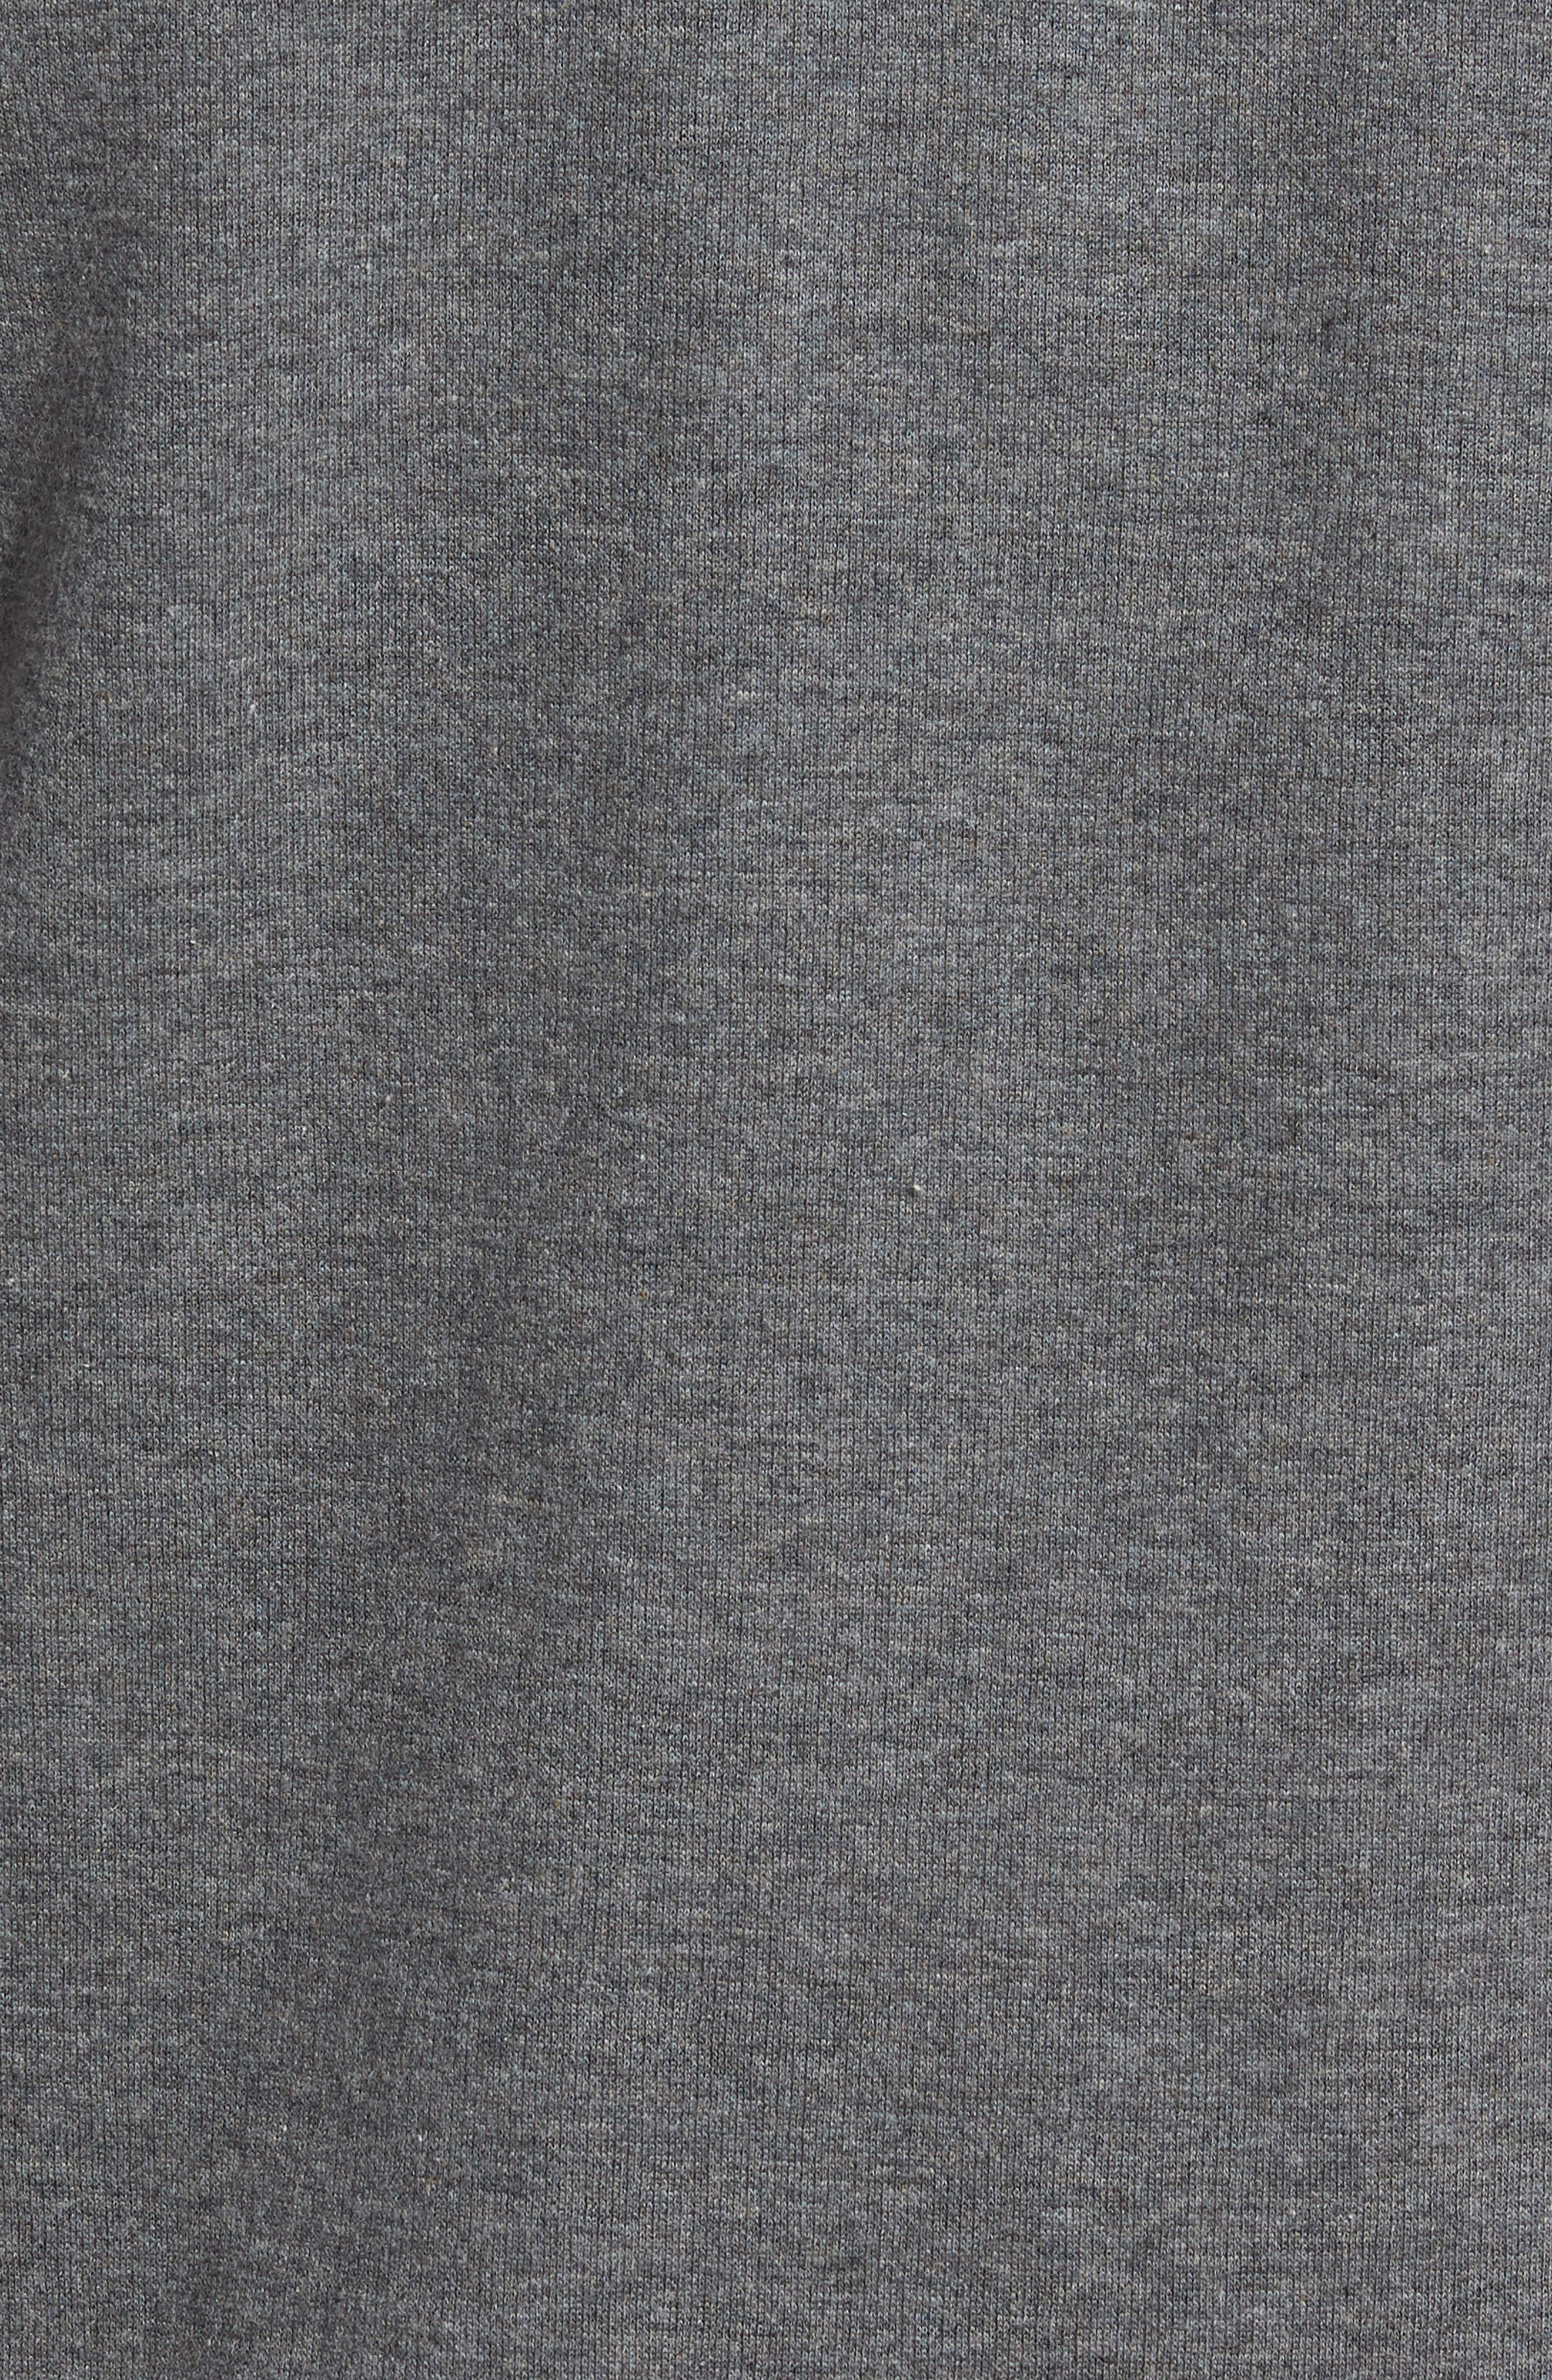 Full Zip Fleece Jacket,                             Alternate thumbnail 5, color,                             021